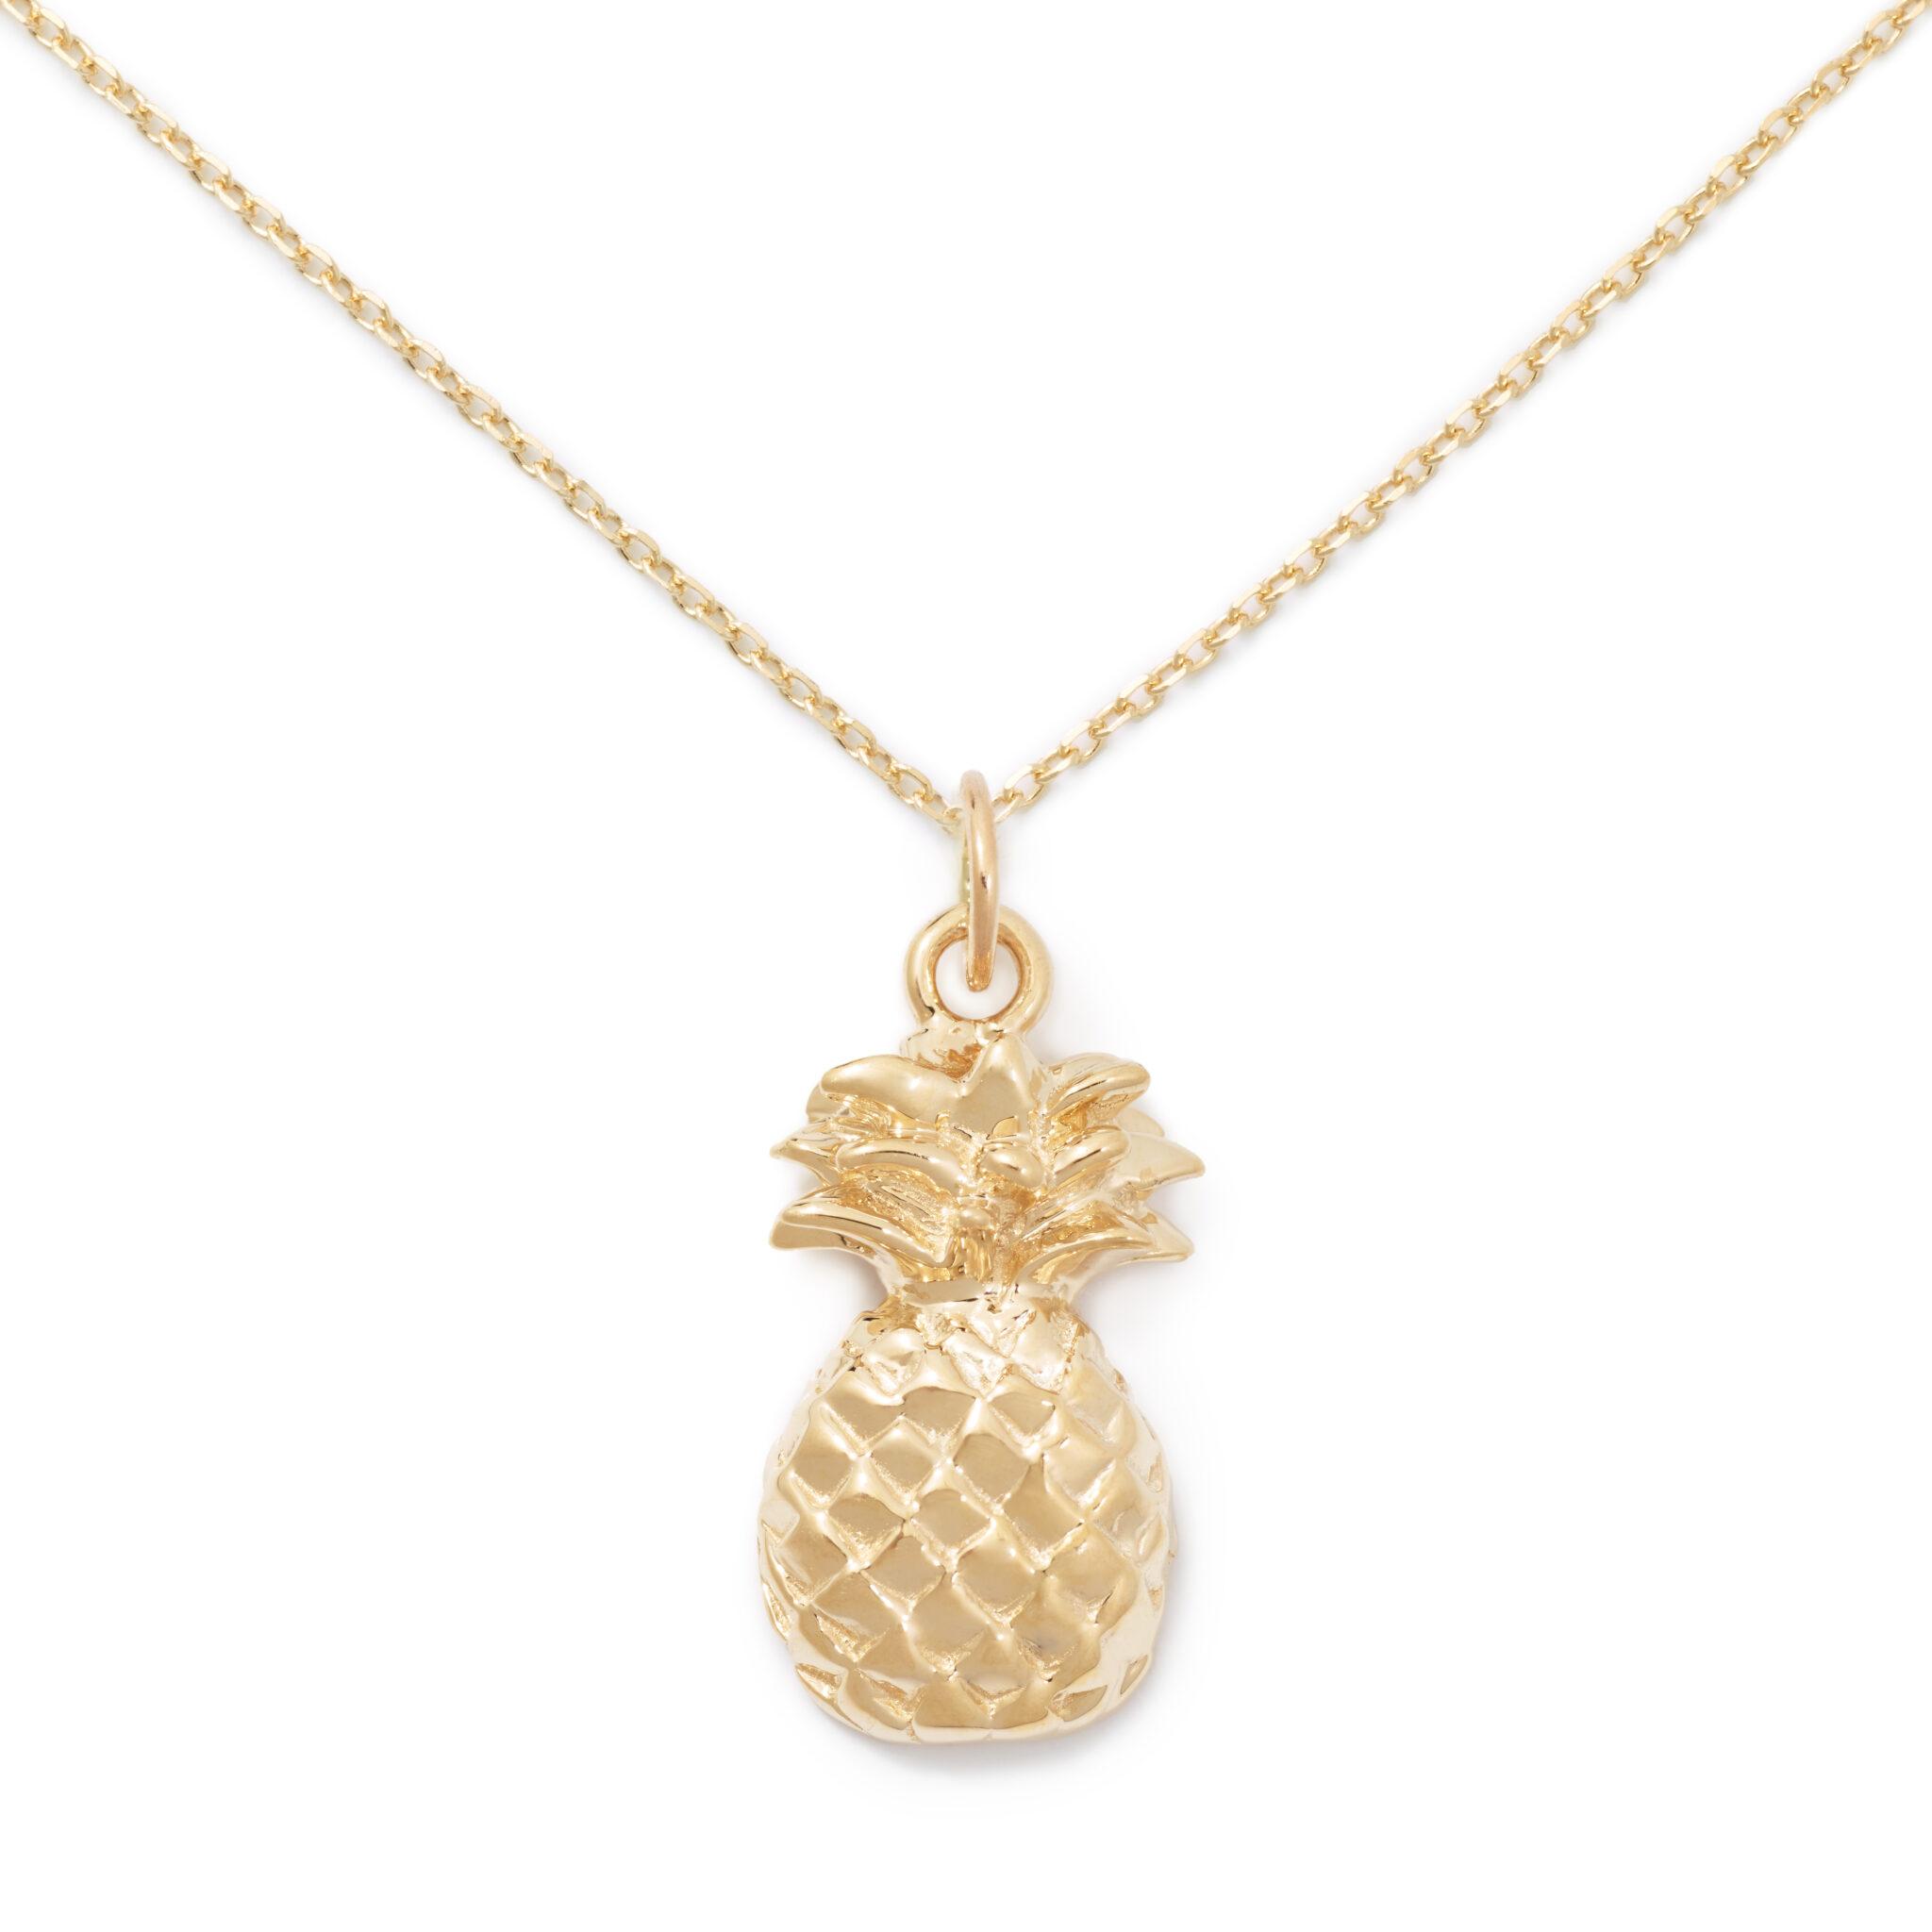 14K Yellow Gold Pineapple Pendant